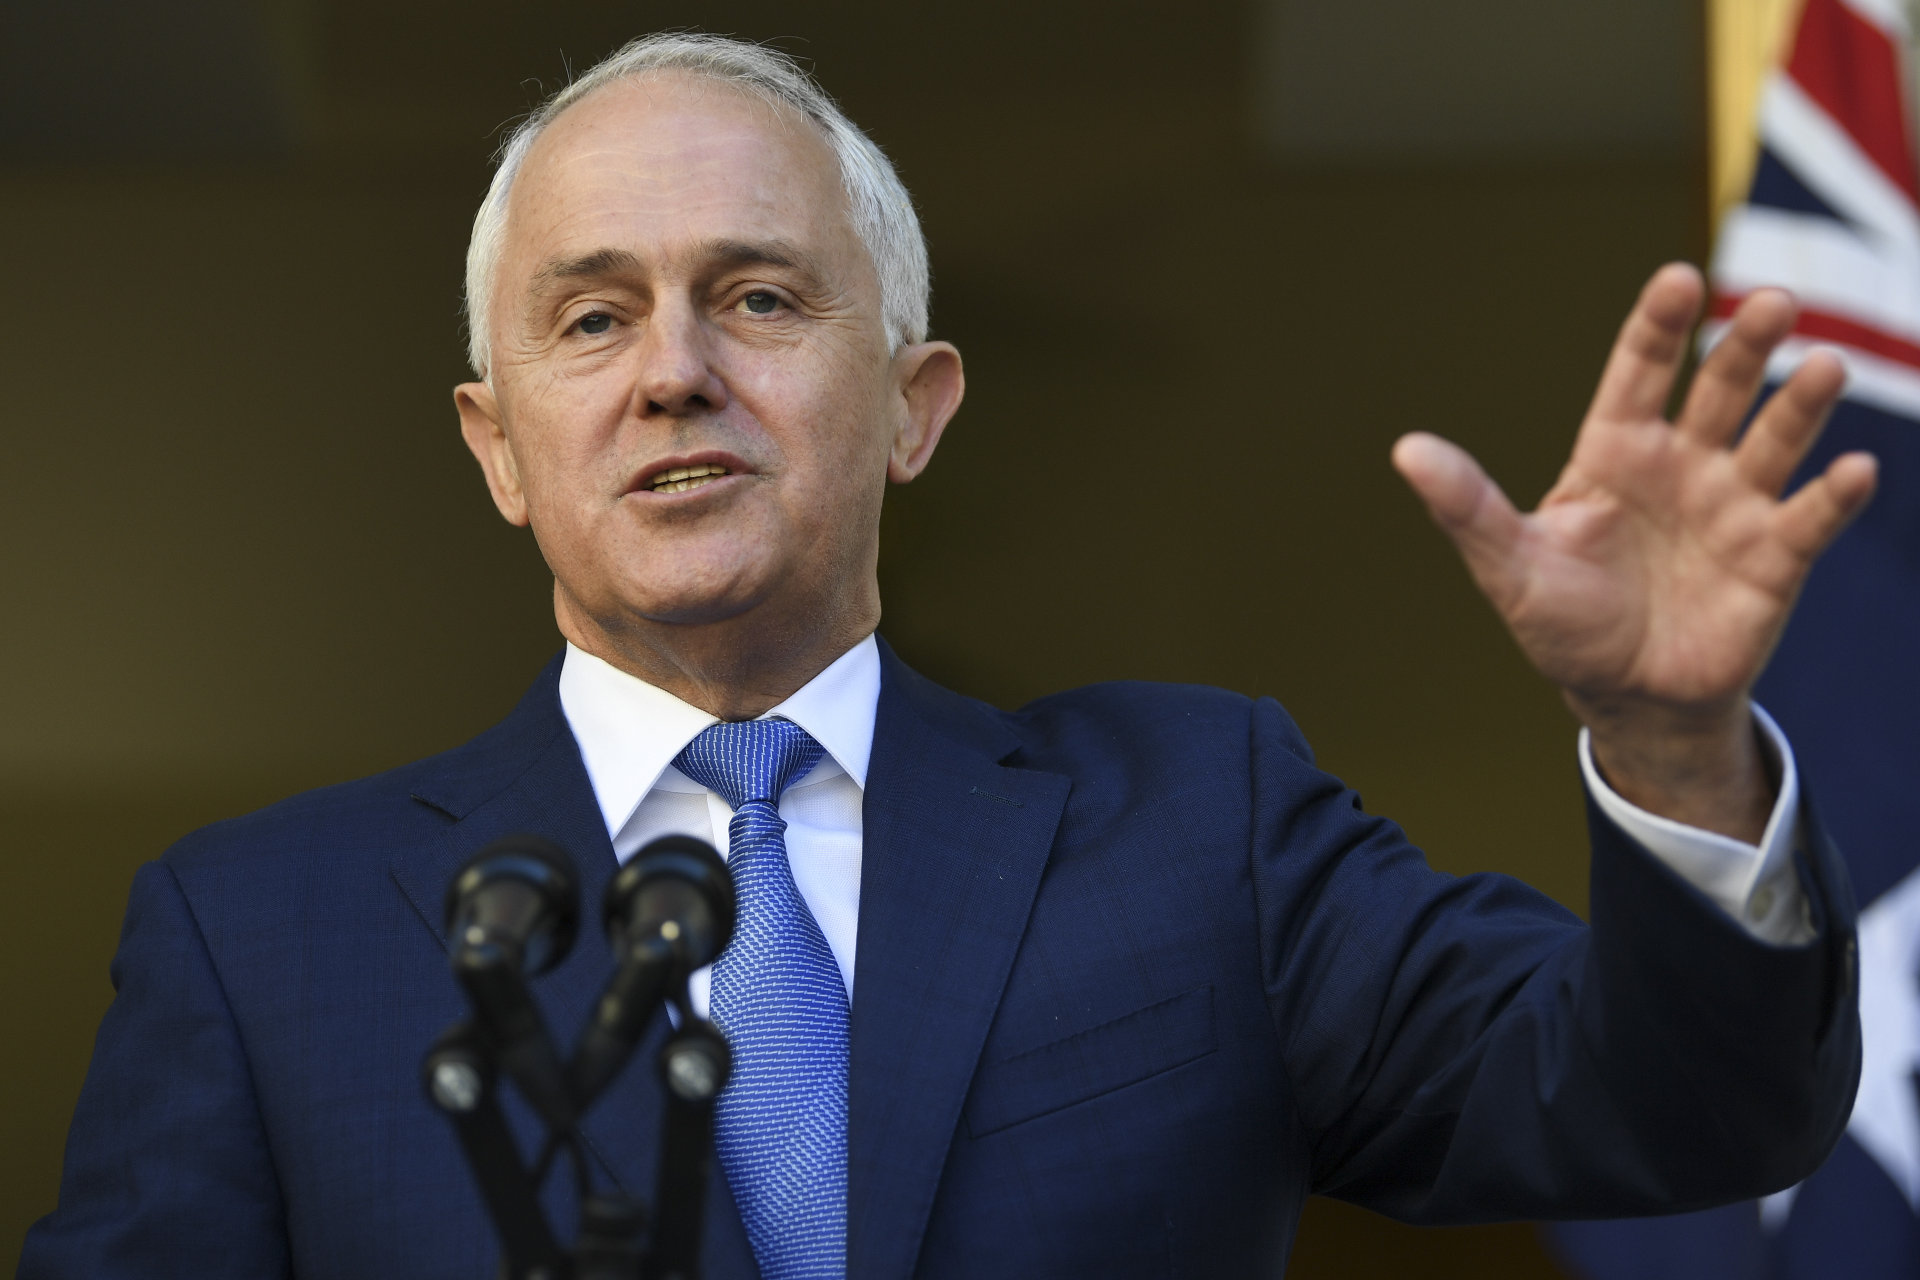 NSW deputy premier says Turnbull should go